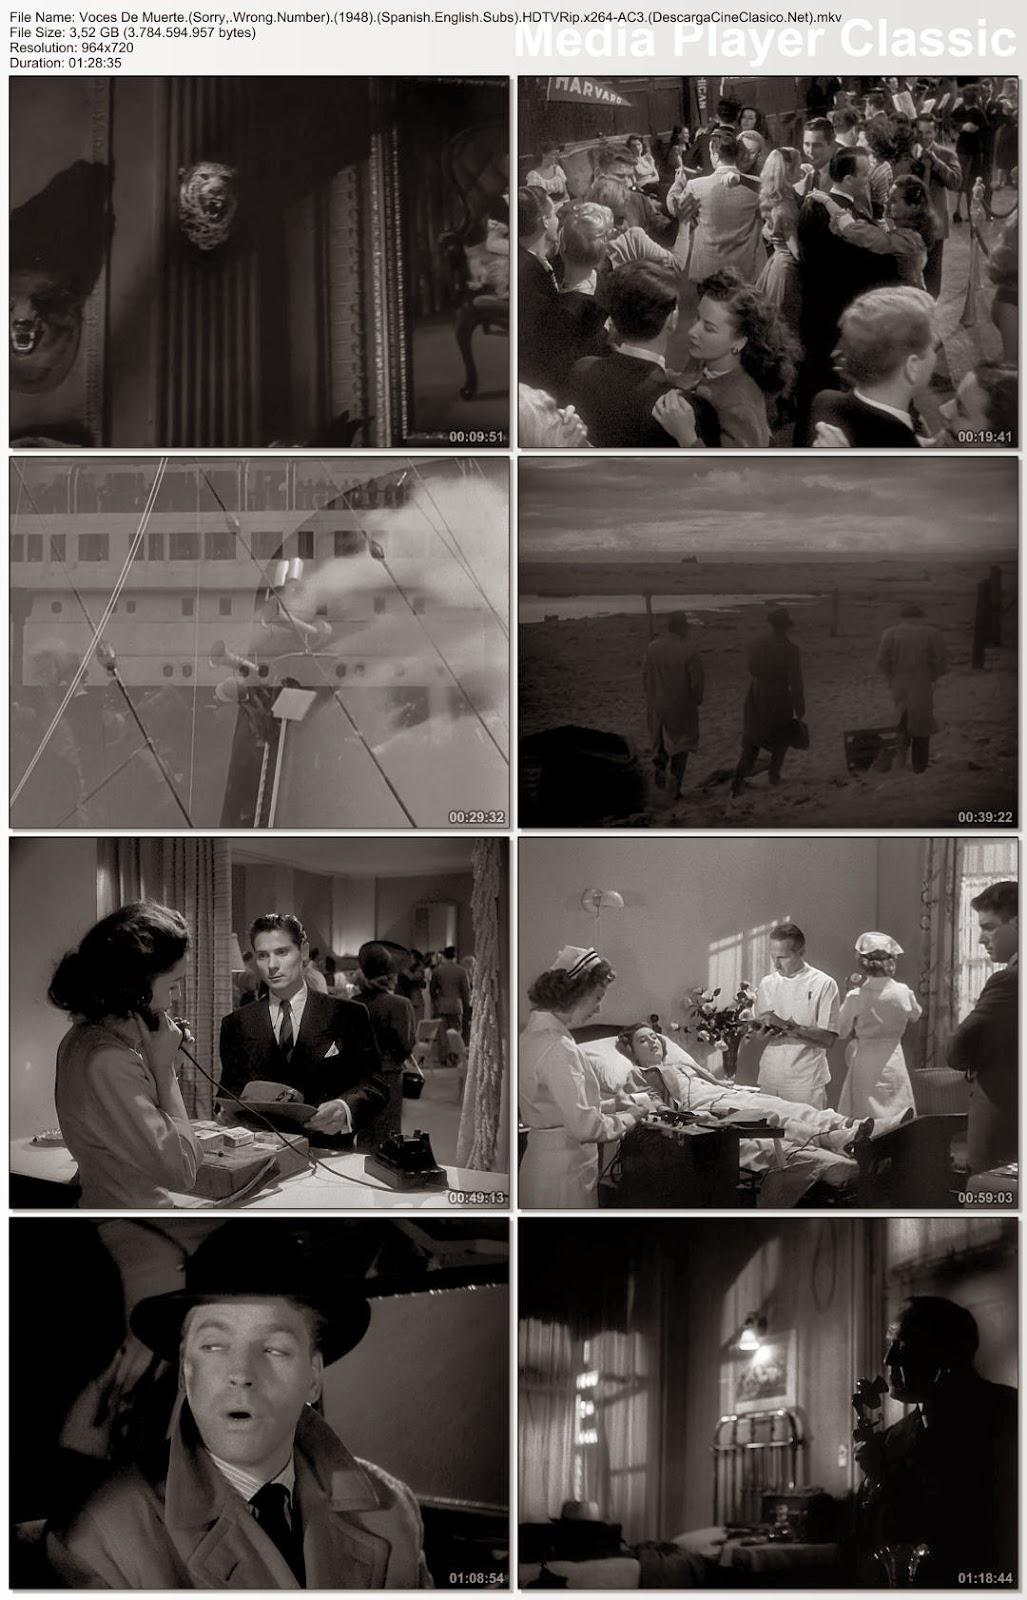 peícula: Voces de muerte 1948